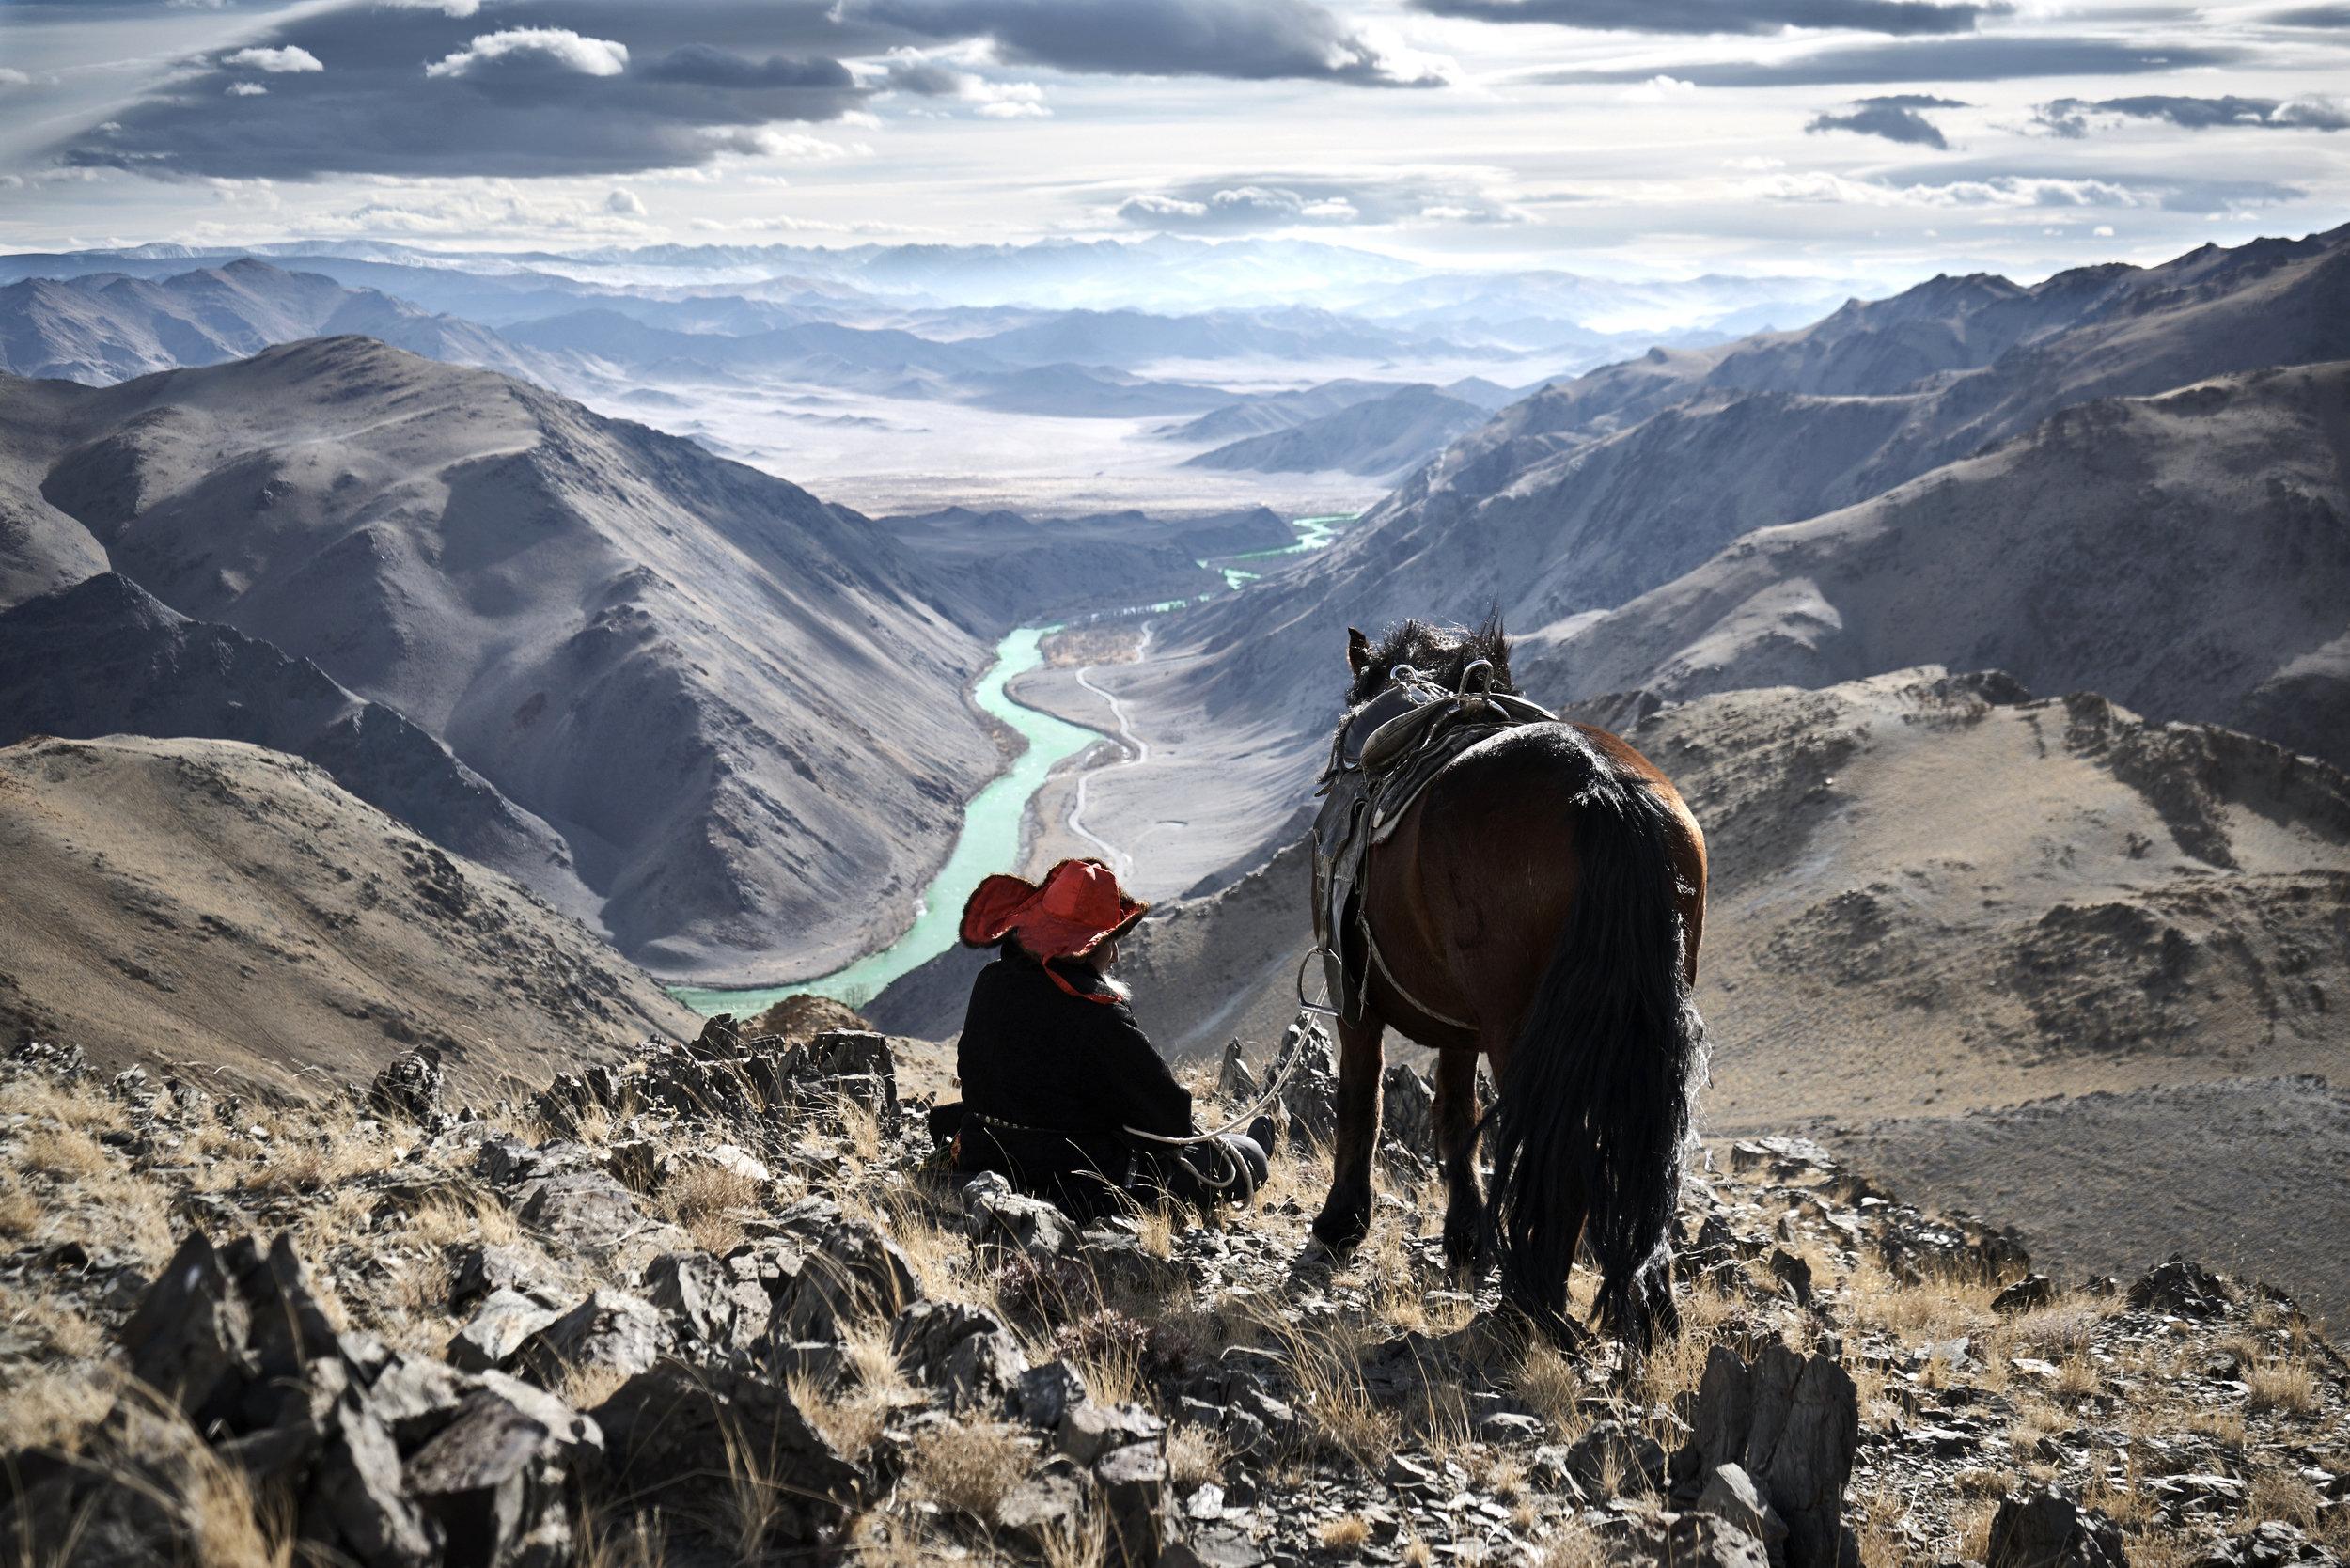 Khasar_S_ManAndHisHat_Altantsogts_Mongolia_Autumn_2014.jpg